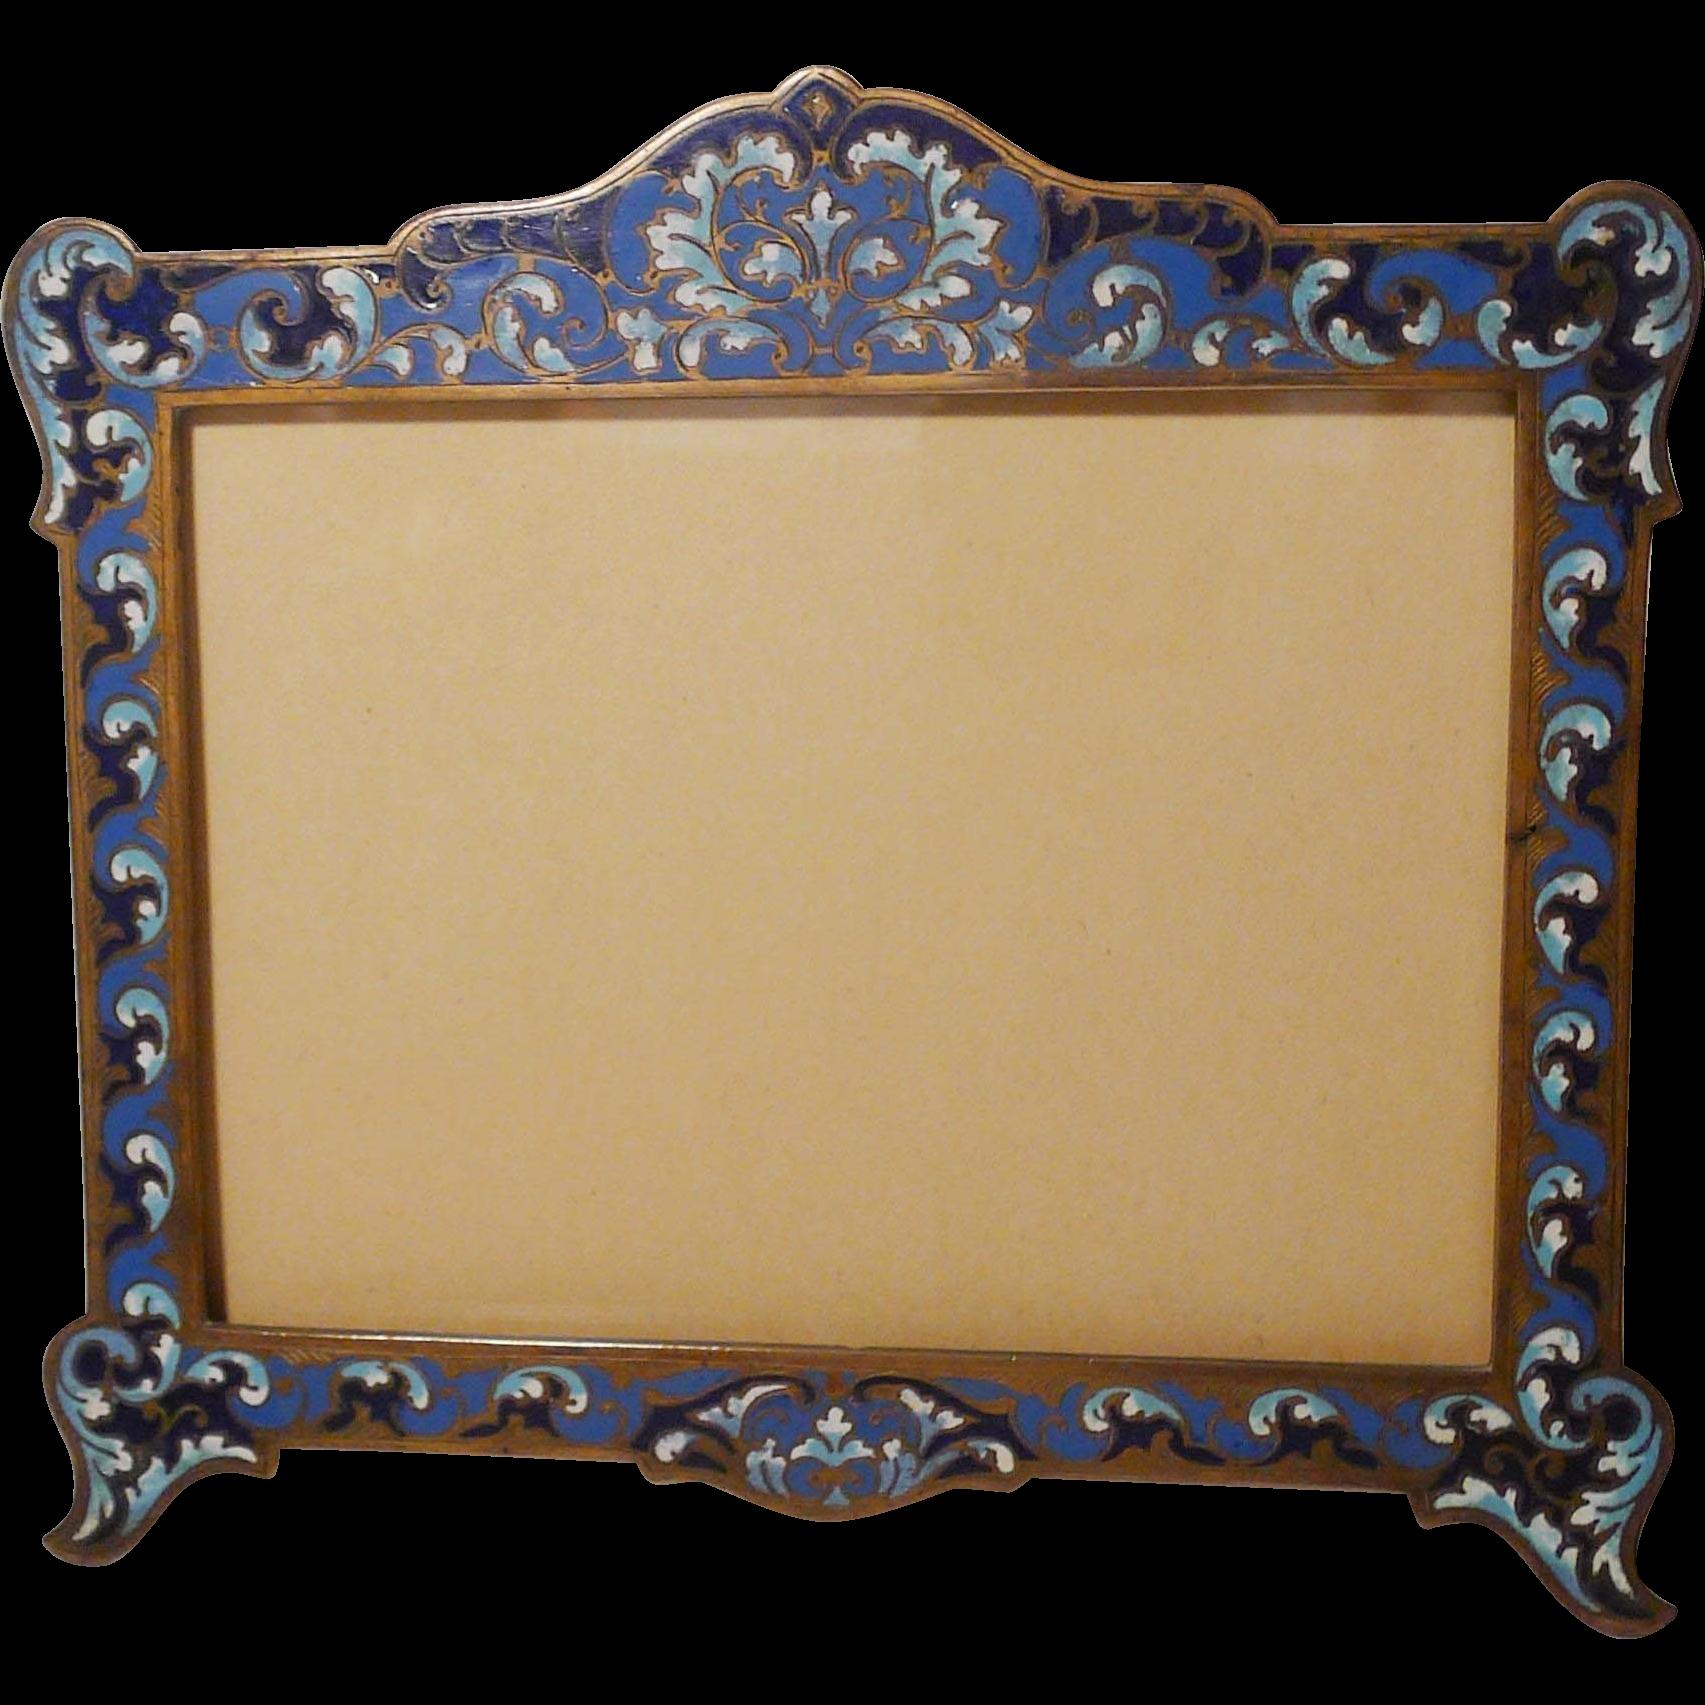 French bronze champleve enamel picture frame horizontal french bronze champleve enamel picture frame jeuxipadfo Choice Image